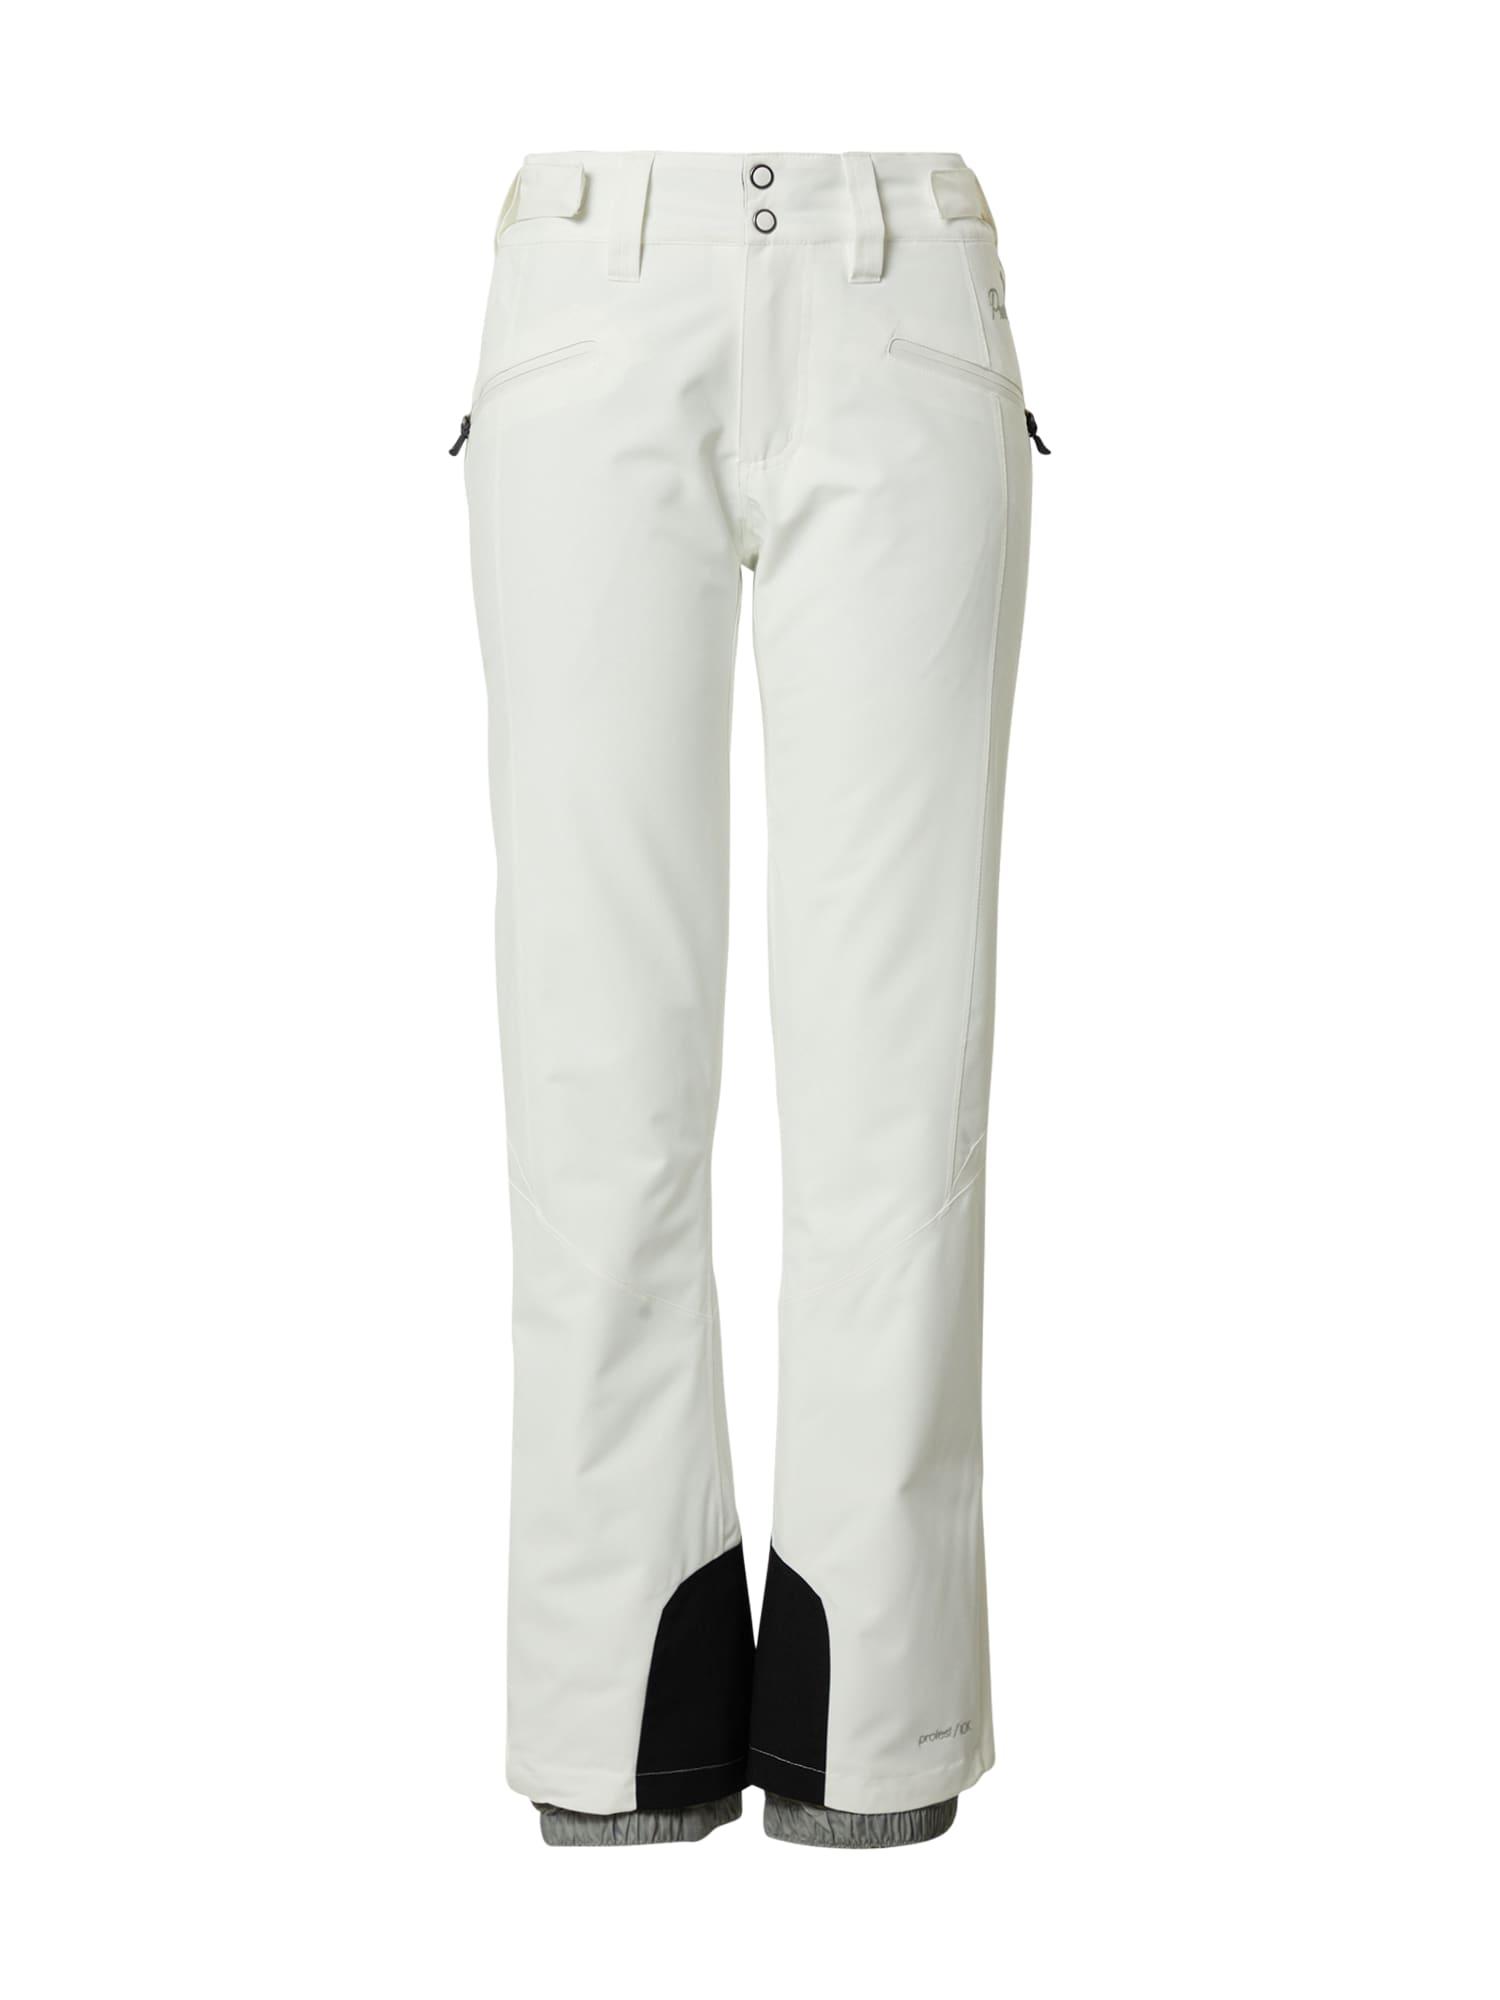 PROTEST Outdoorové kalhoty 'KENSINGTON'  bílá / černá